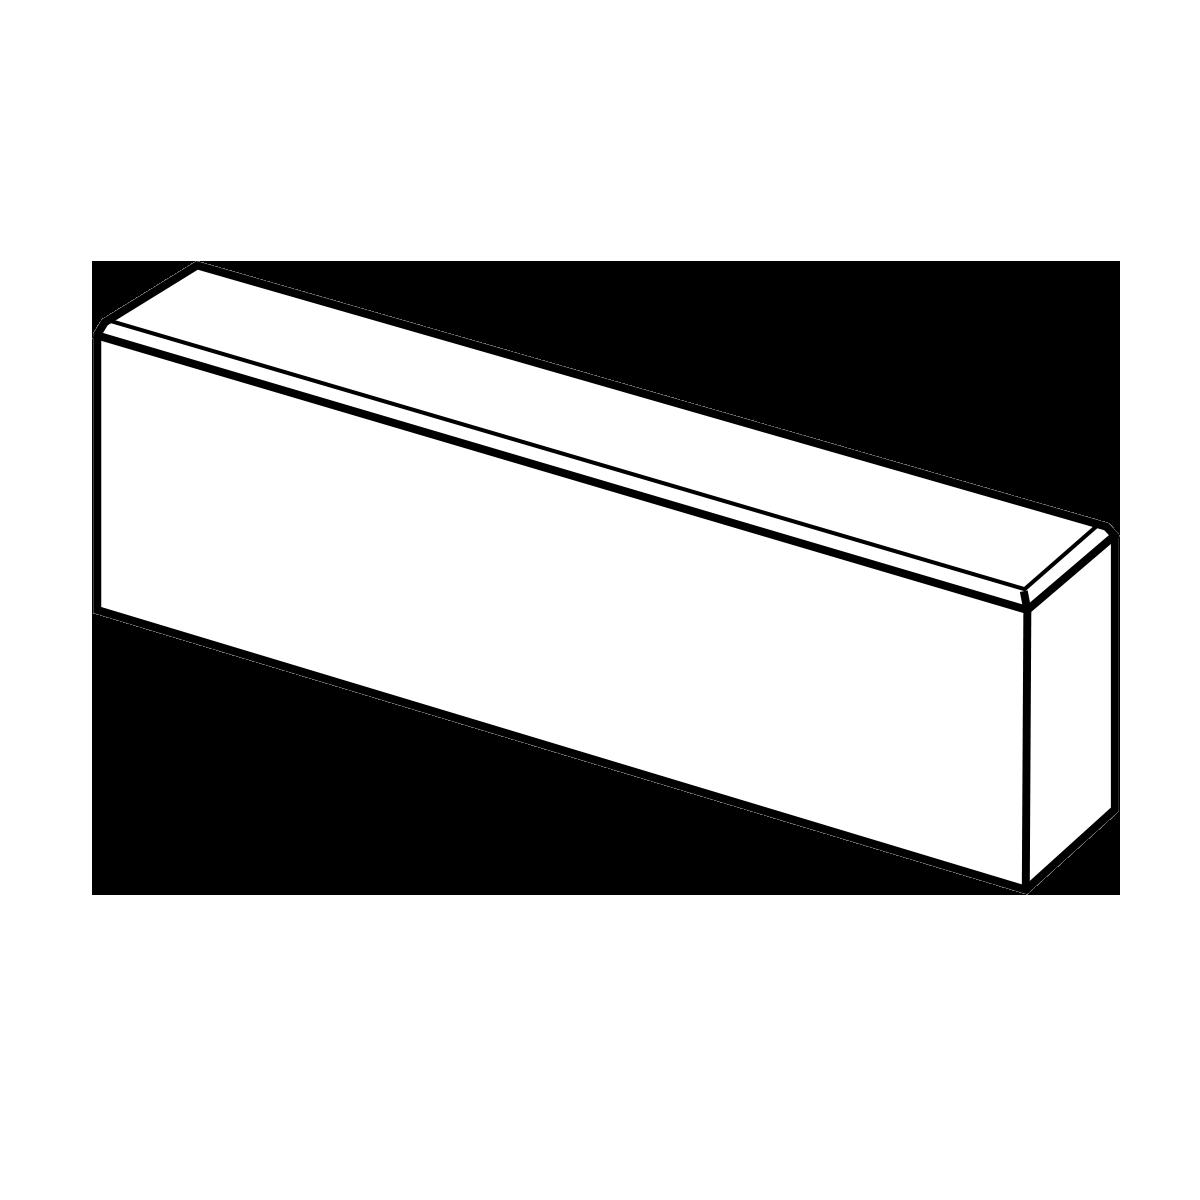 Kantningssten 10x30x60 cm Grå